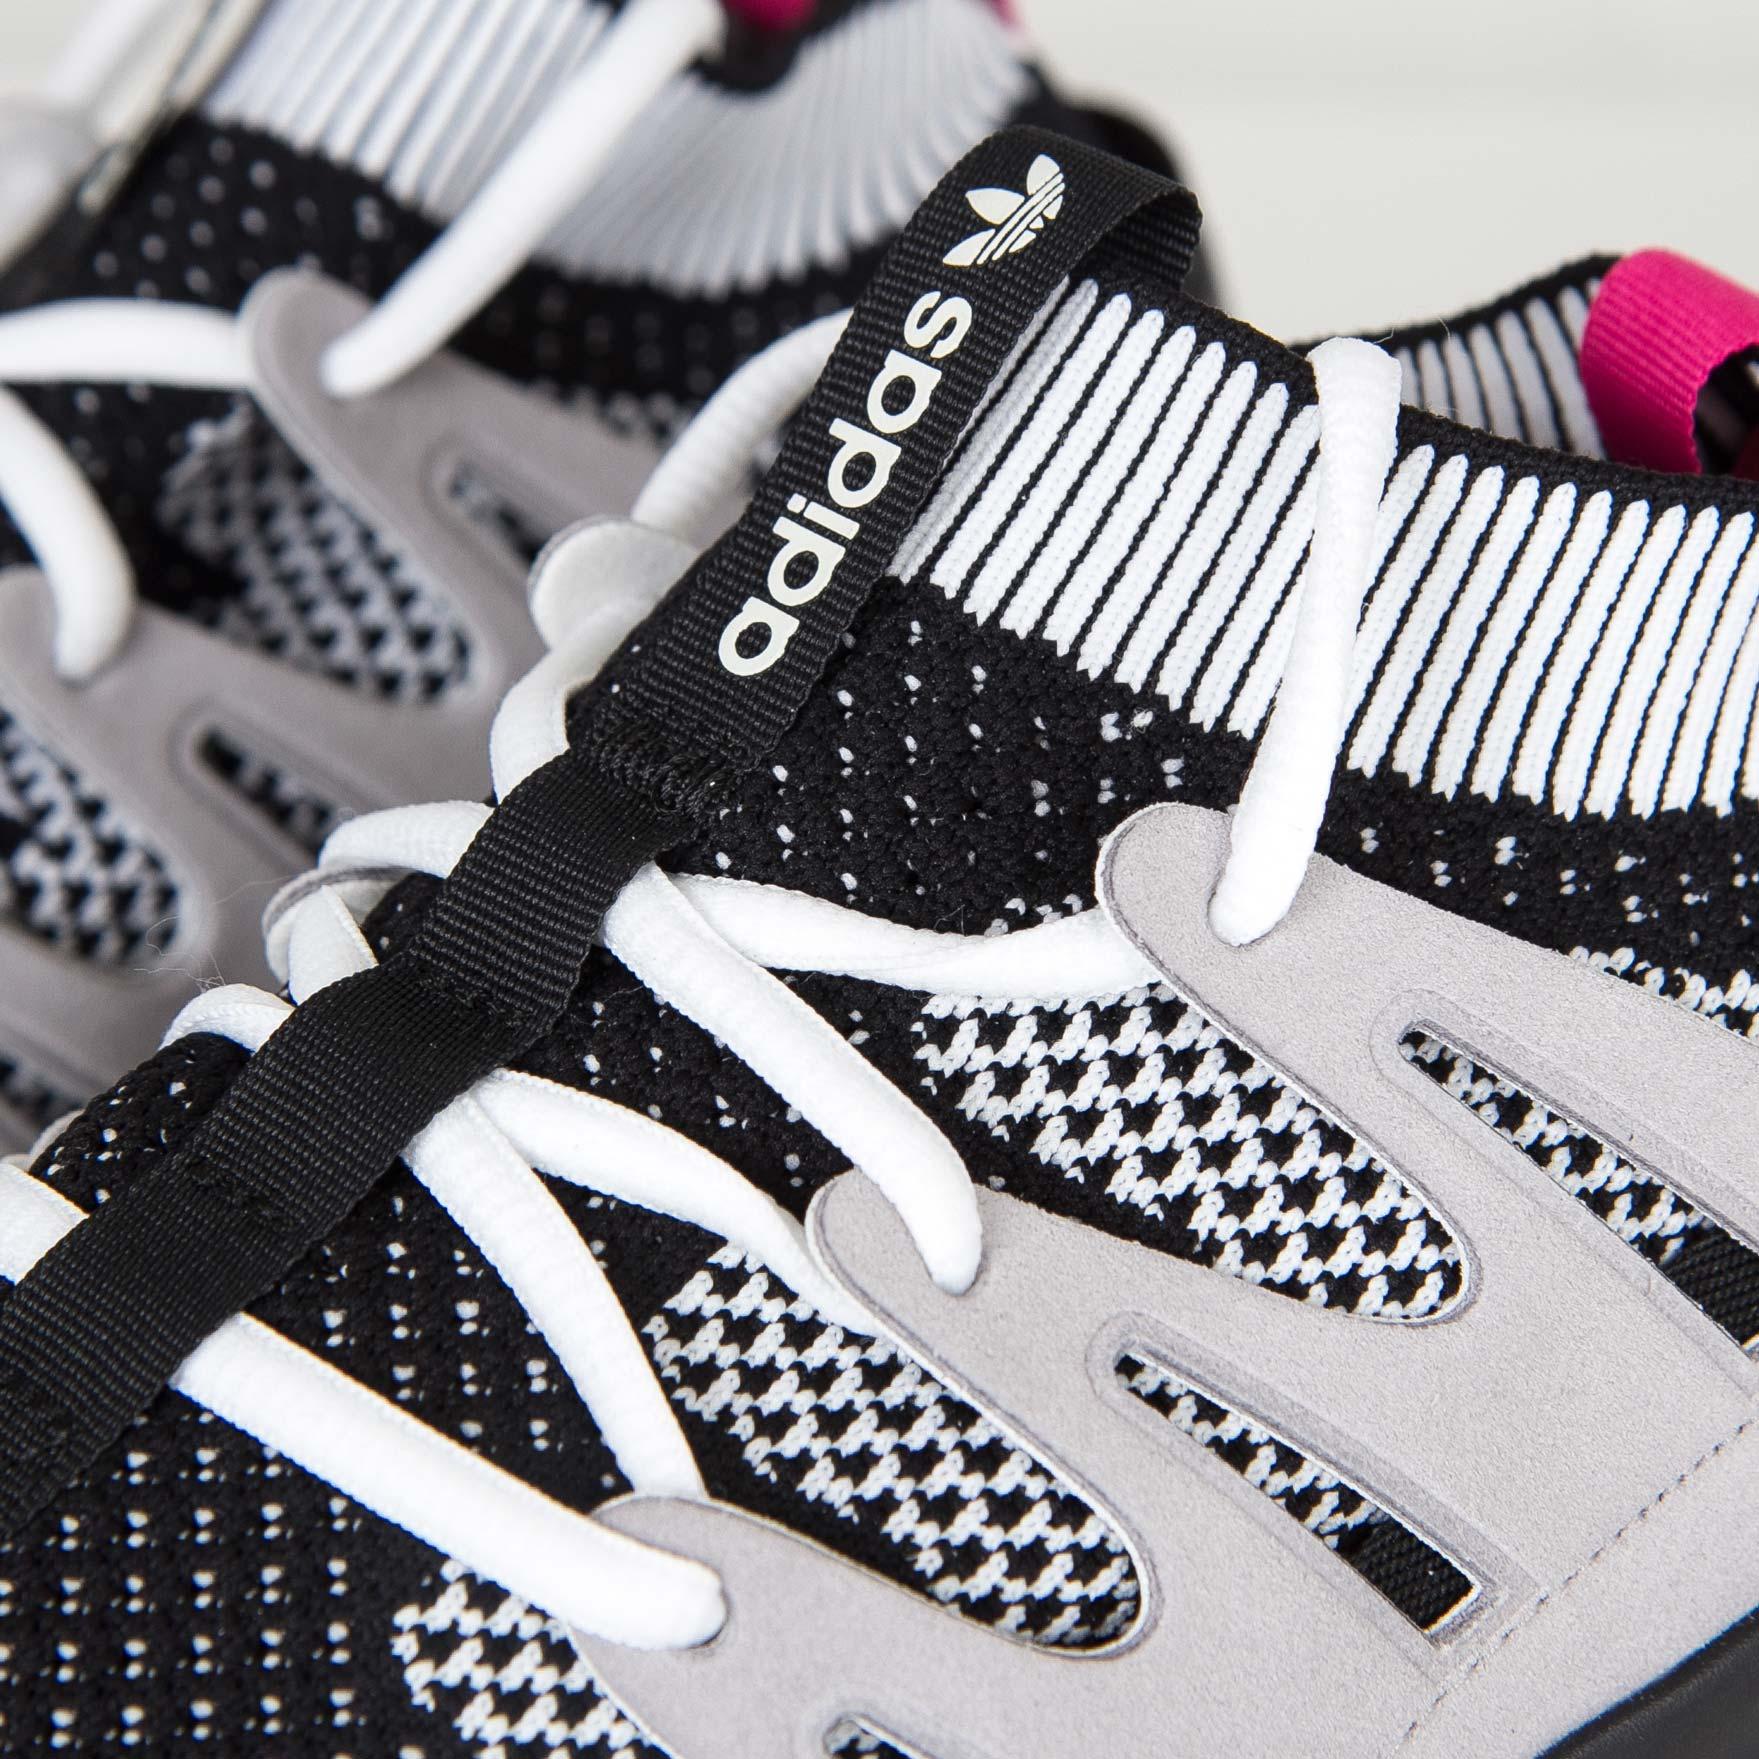 premium selection b982a 6c57a adidas Tubular Nova PK - S74918 - Sneakersnstuff | sneakers ...